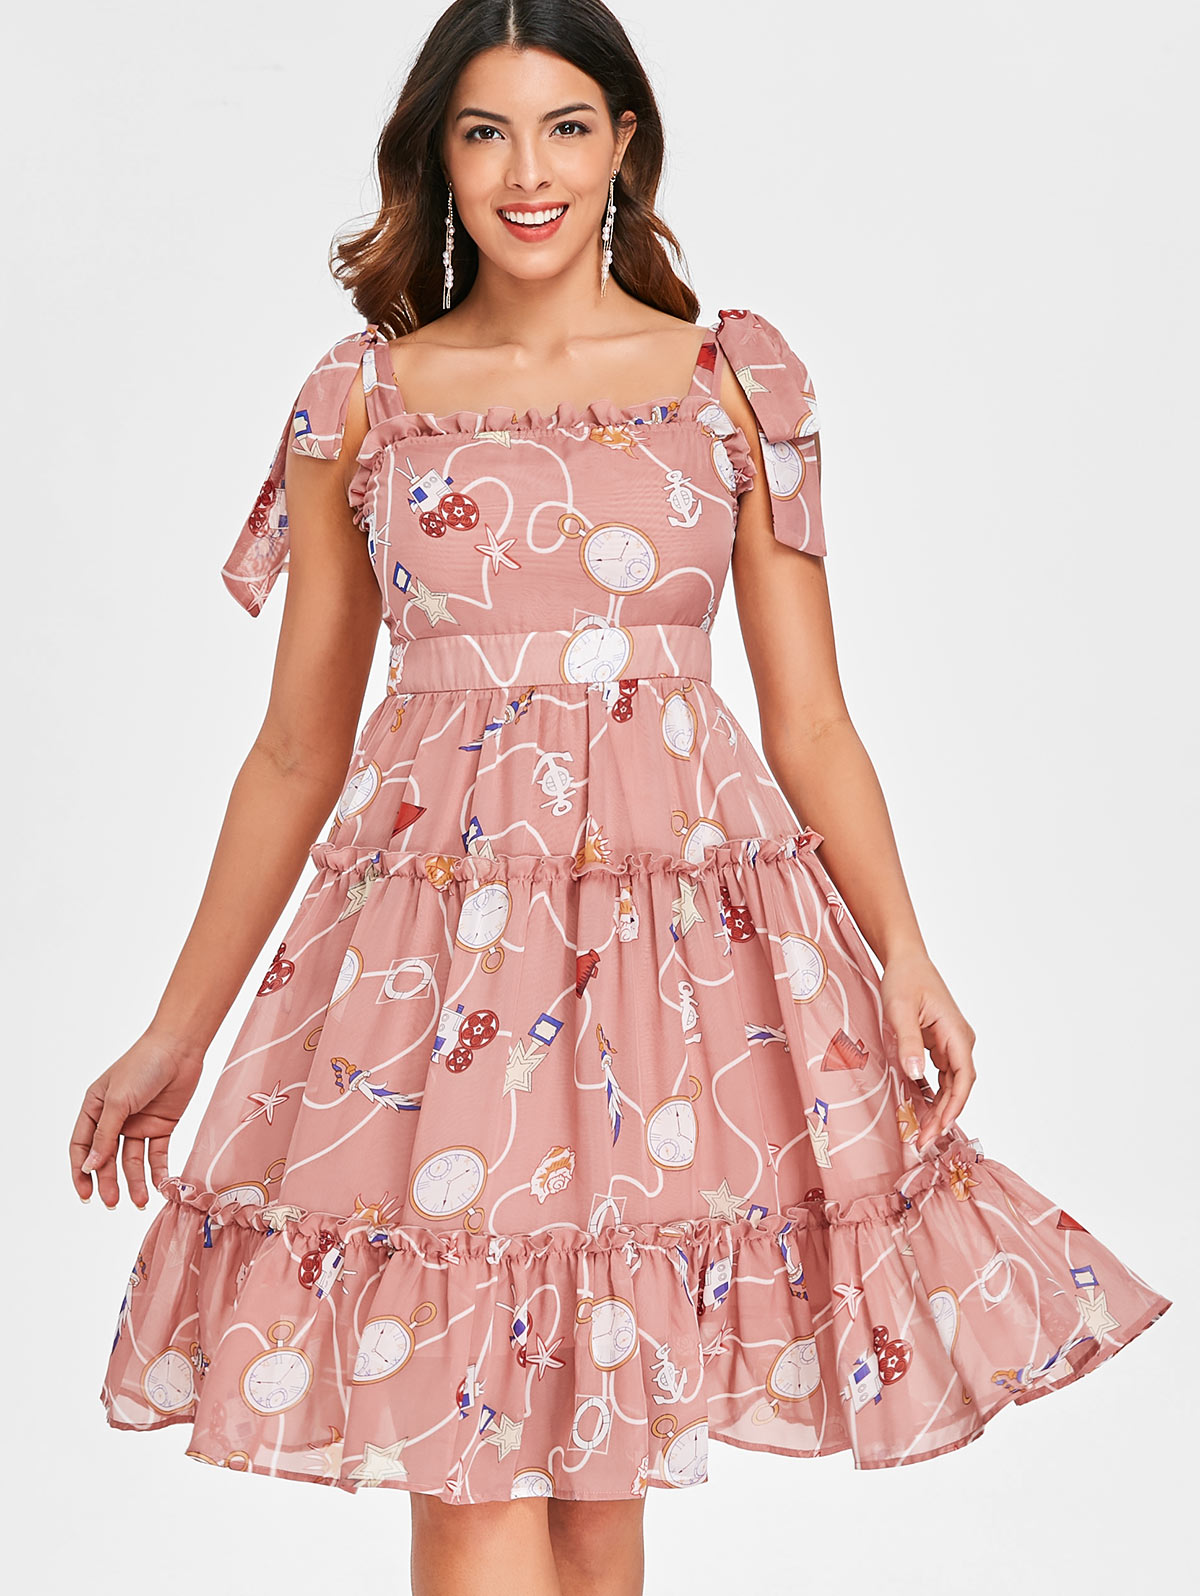 Kenancy Print Tie Up Ruffle Midi Dress Fashion Retro Women